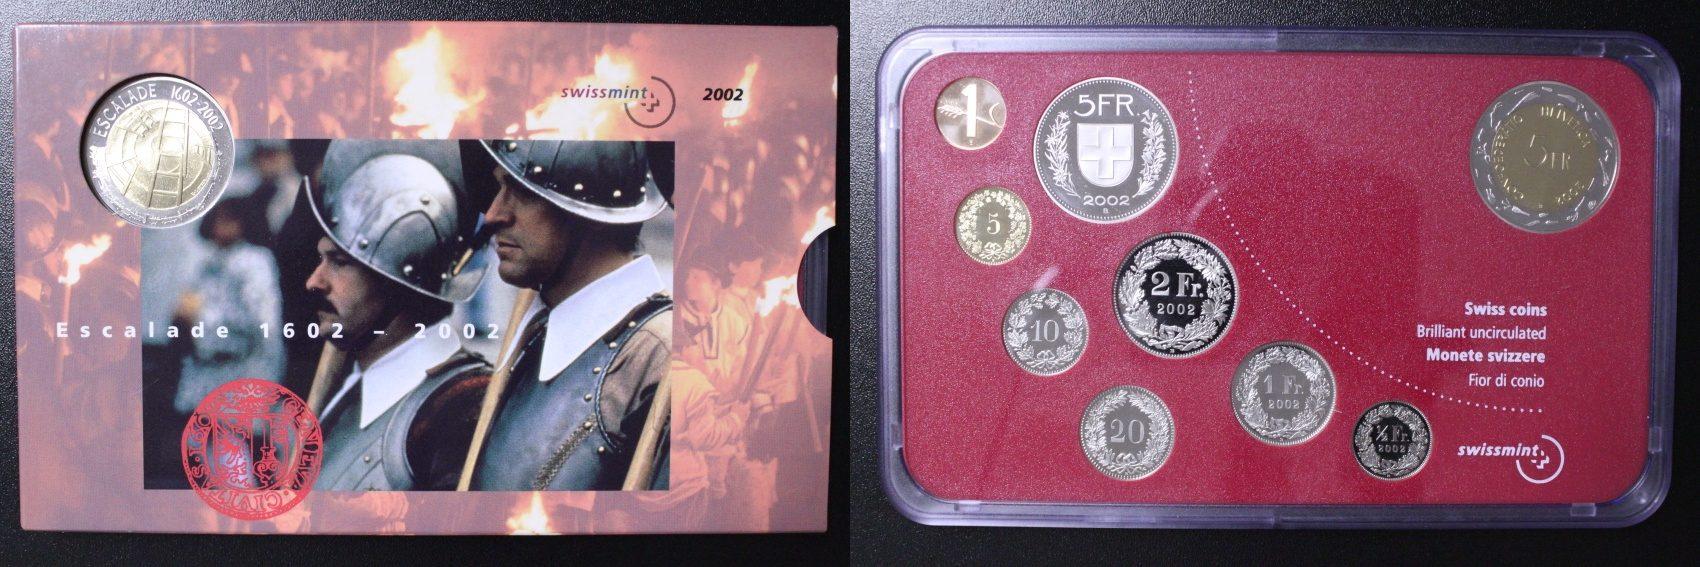 Kursmünzensatz 2002 B Schweiz Kursmünzensatz - 1 Rappen bis 5 Franken + 5 Franken Gedenkmünue Escalade st/Orig.